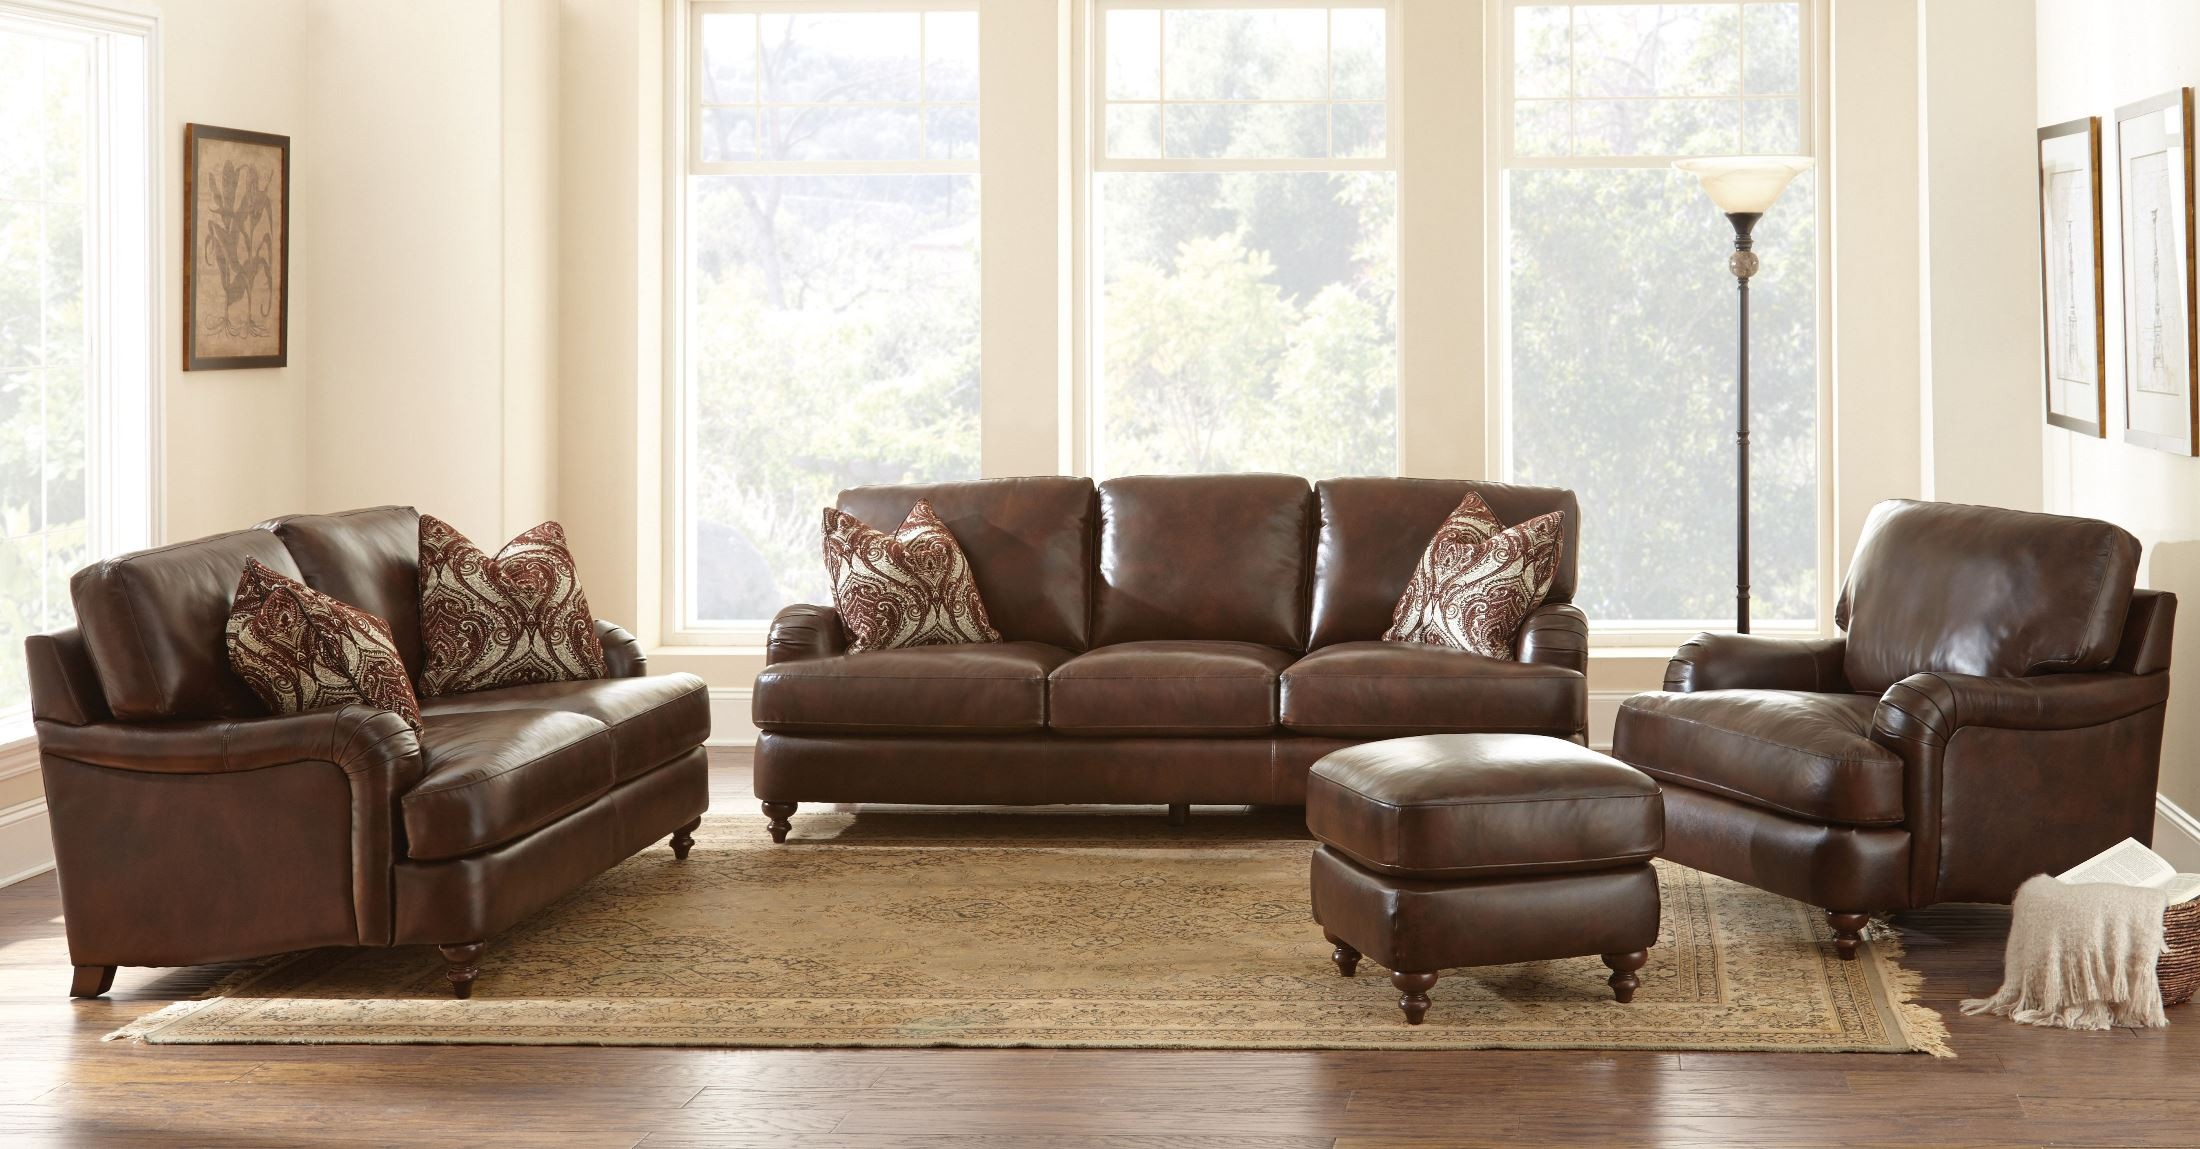 Charles leather living room set cr900s steve silver for Wg r living room sets